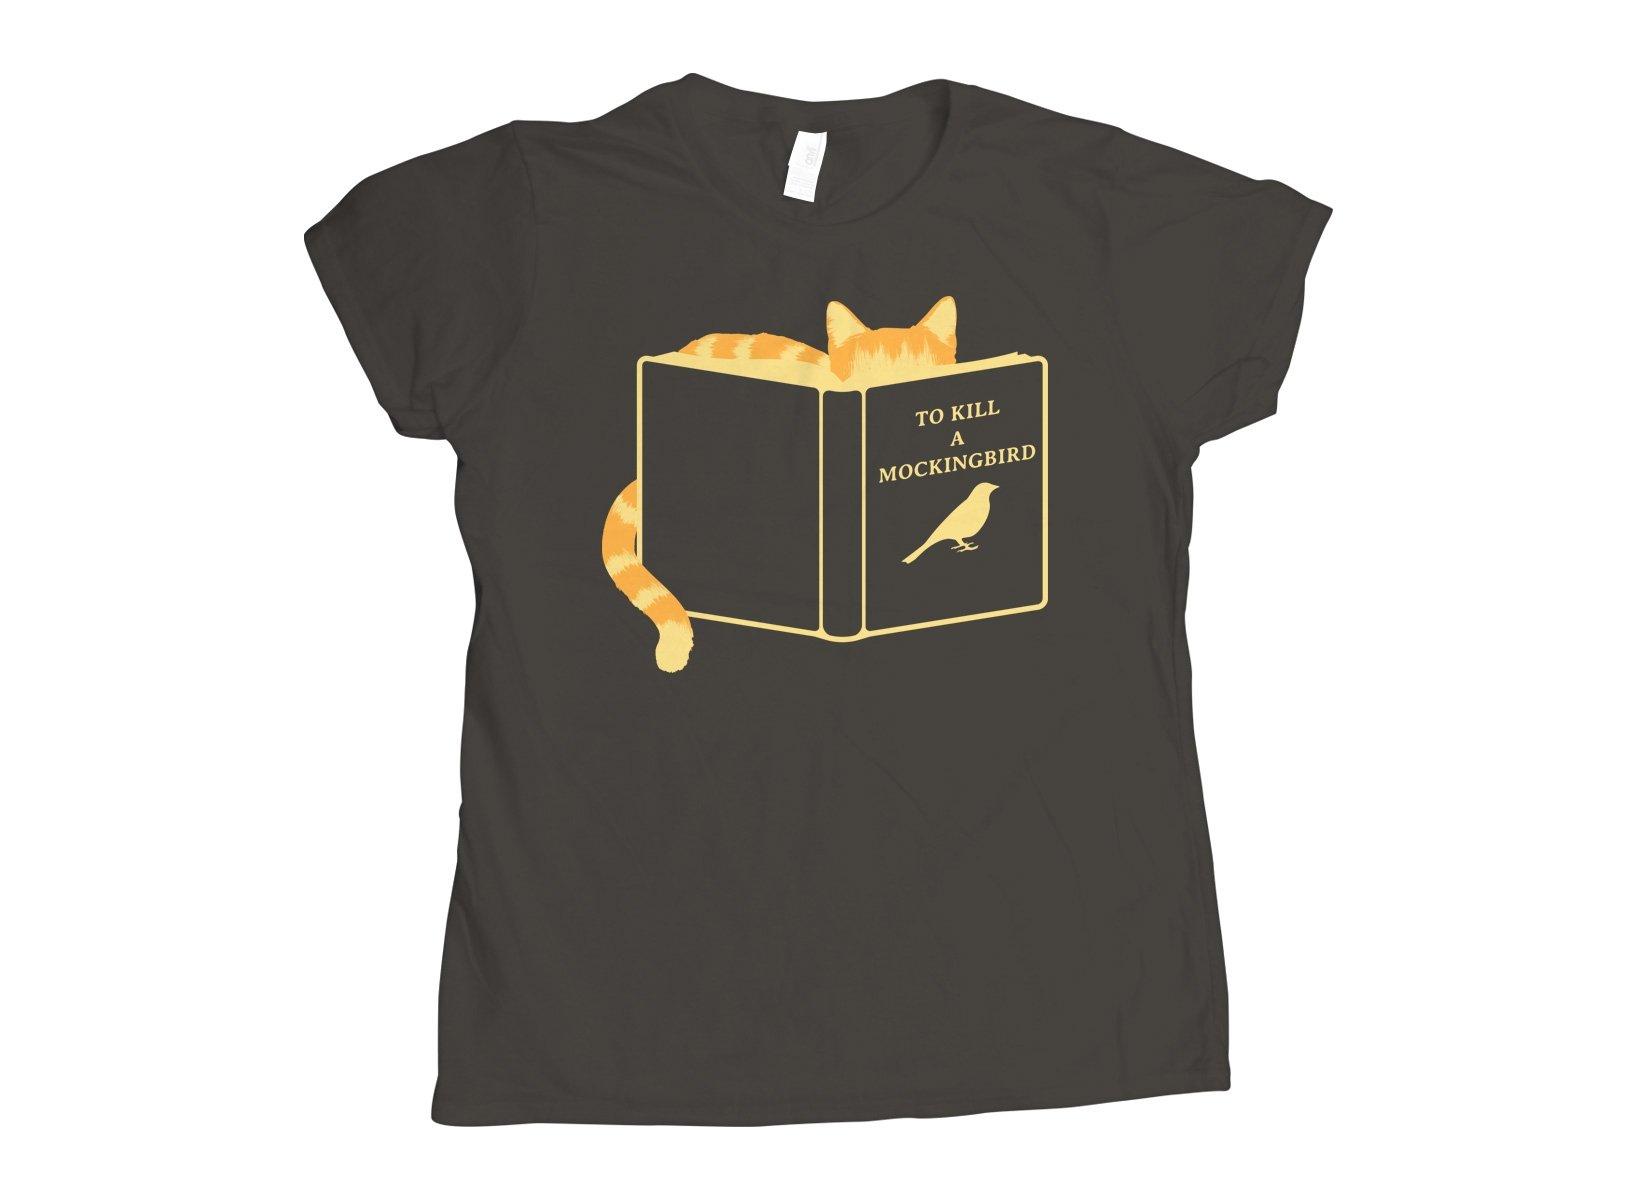 To Kill A Mockingbird on Womens T-Shirt